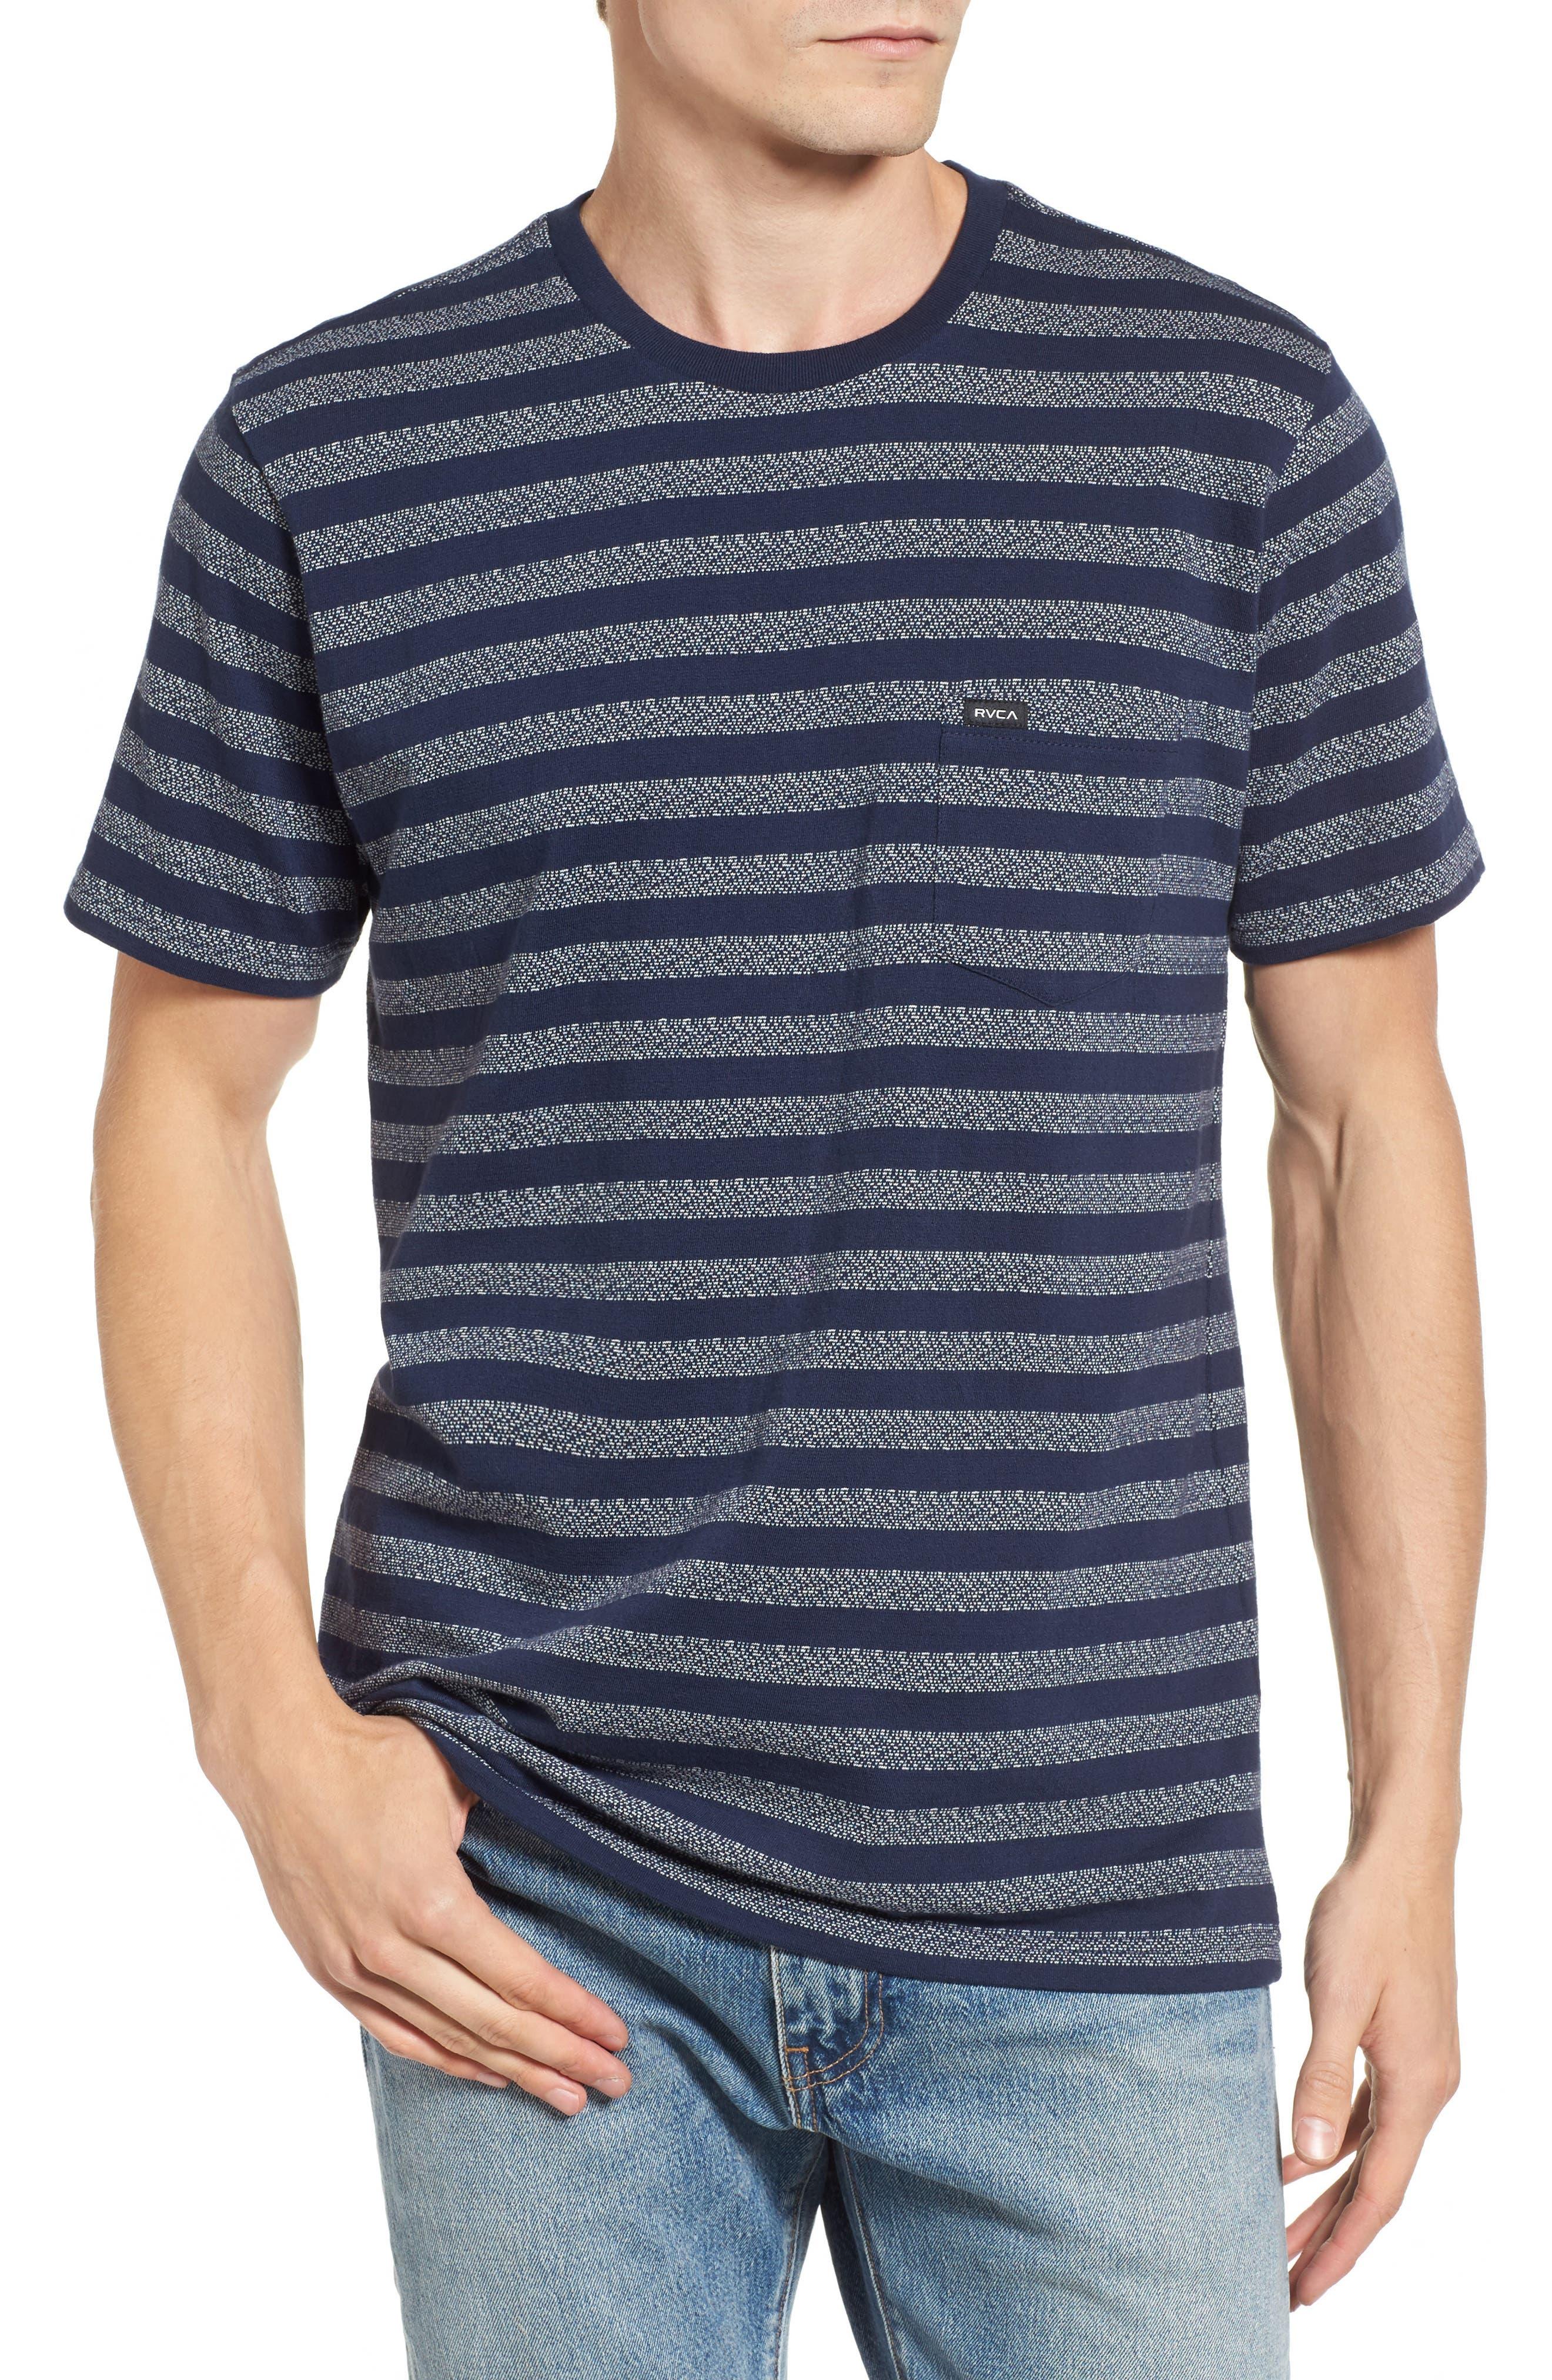 RVCA What's Shakin' Stripe T-Shirt